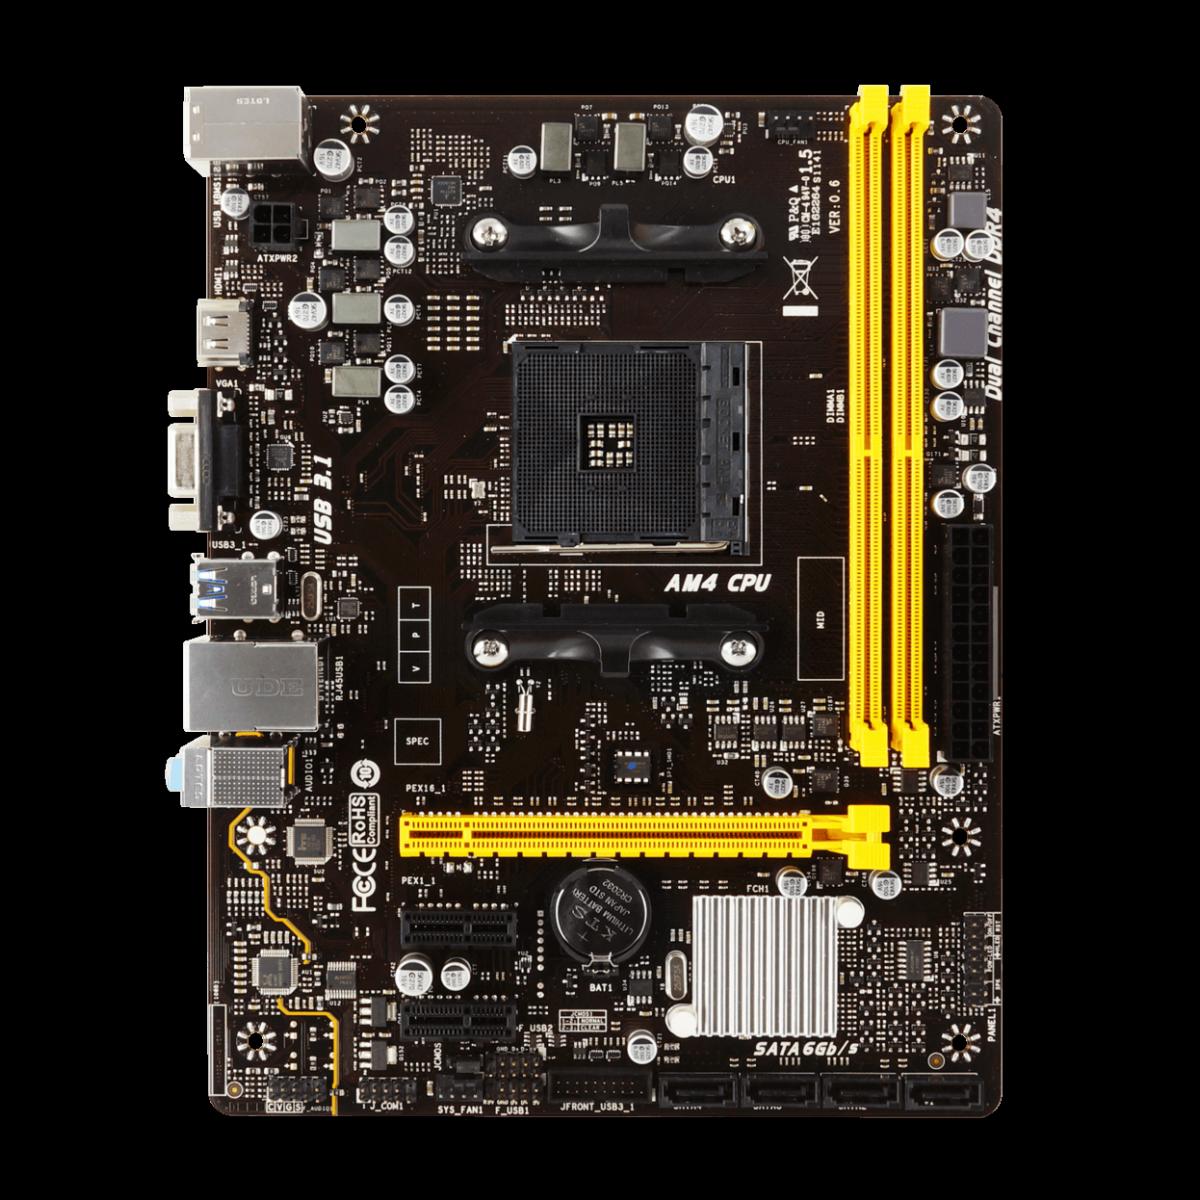 Kit Upgrade Biostar Radeon Rx 550 2GB + Ryzen 3 3300x + Biostar A320MH + Cooler de Brinde